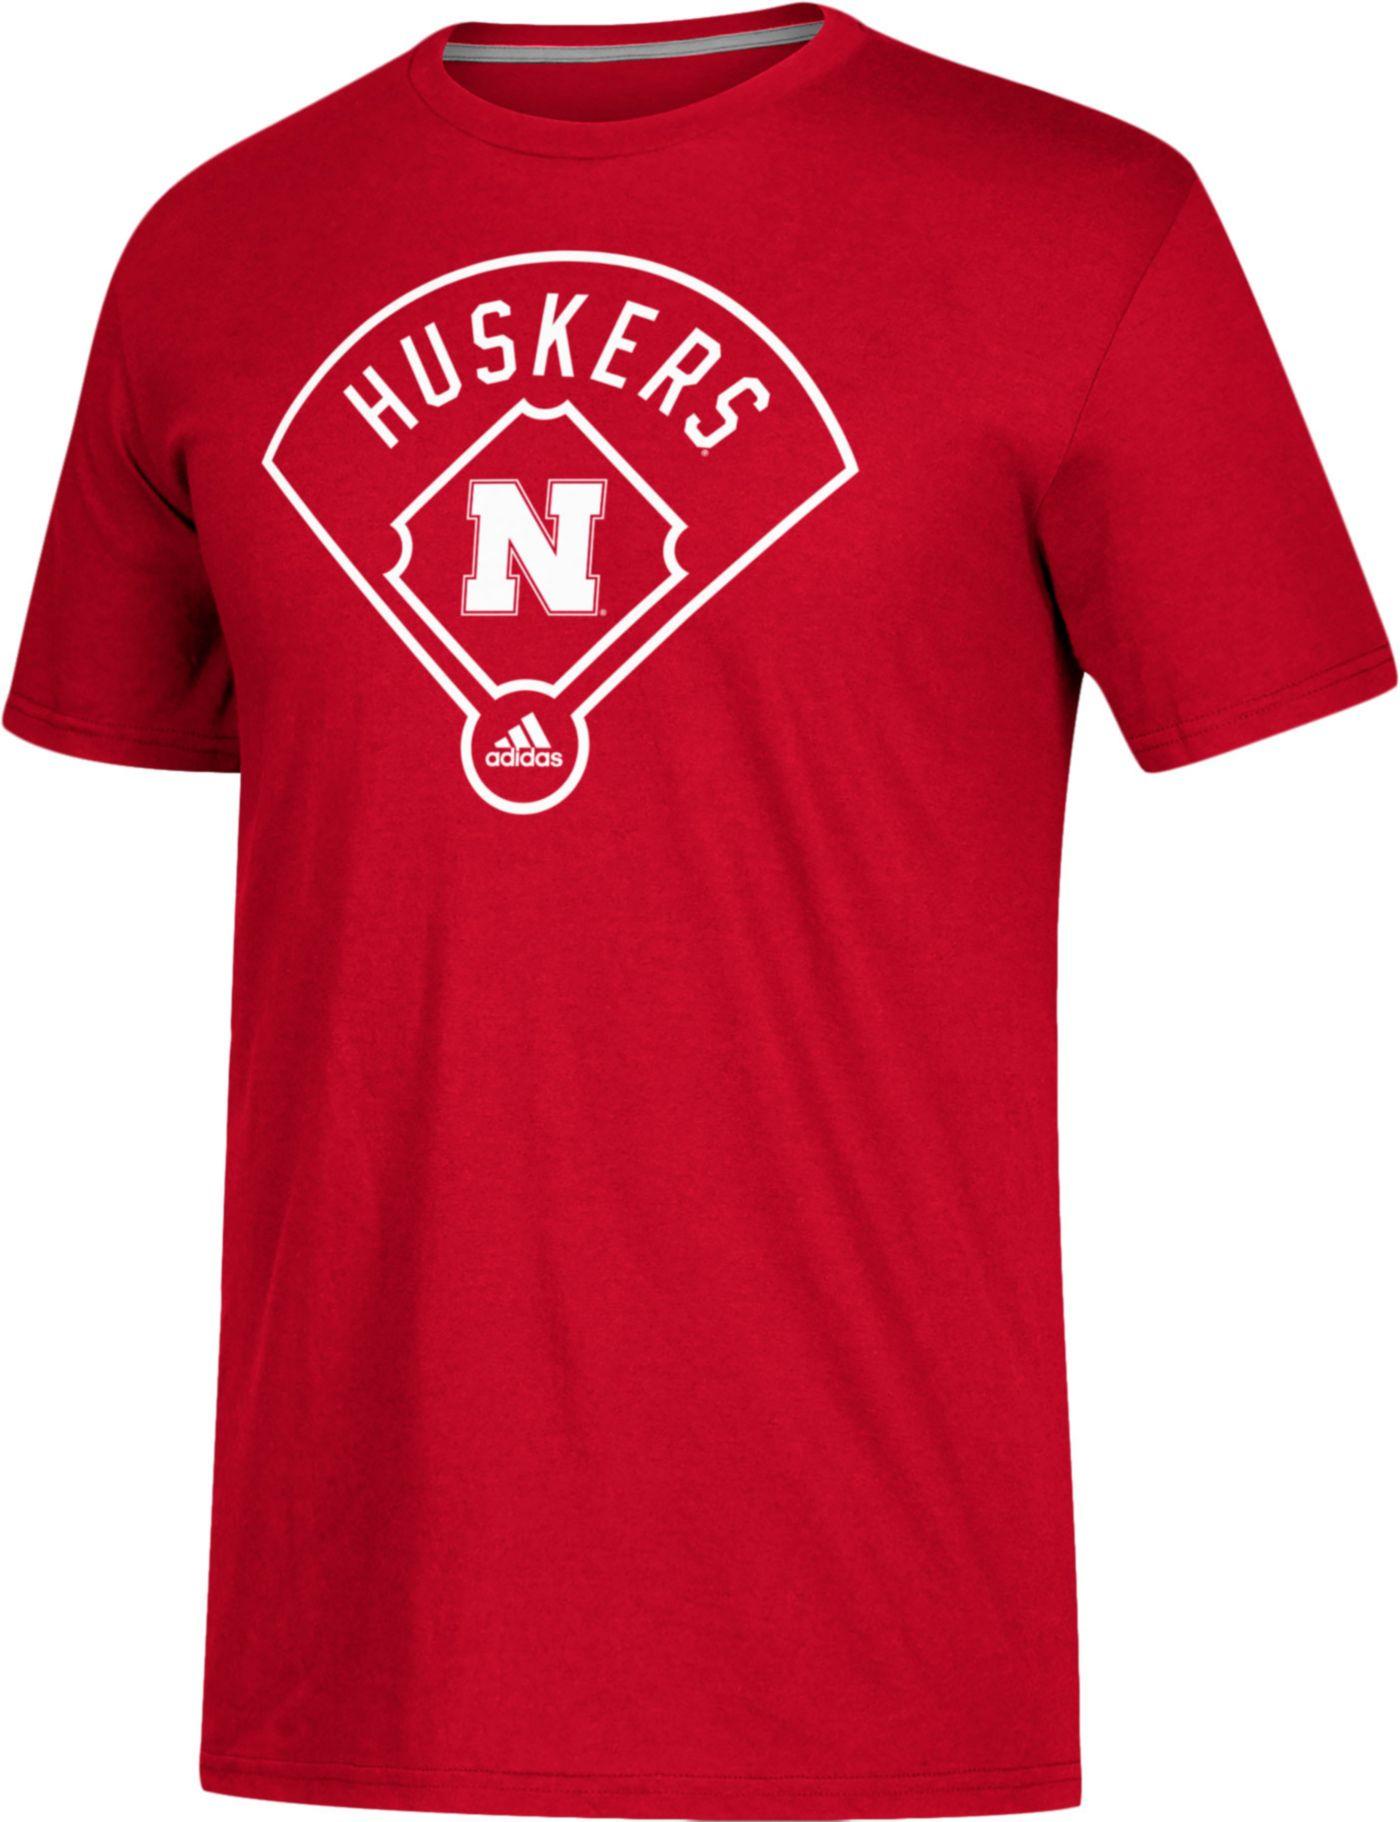 adidas Men's Nebraska Cornhuskers Scarlet 'Around The Horn' Go-To Performance Baseball T-Shirt